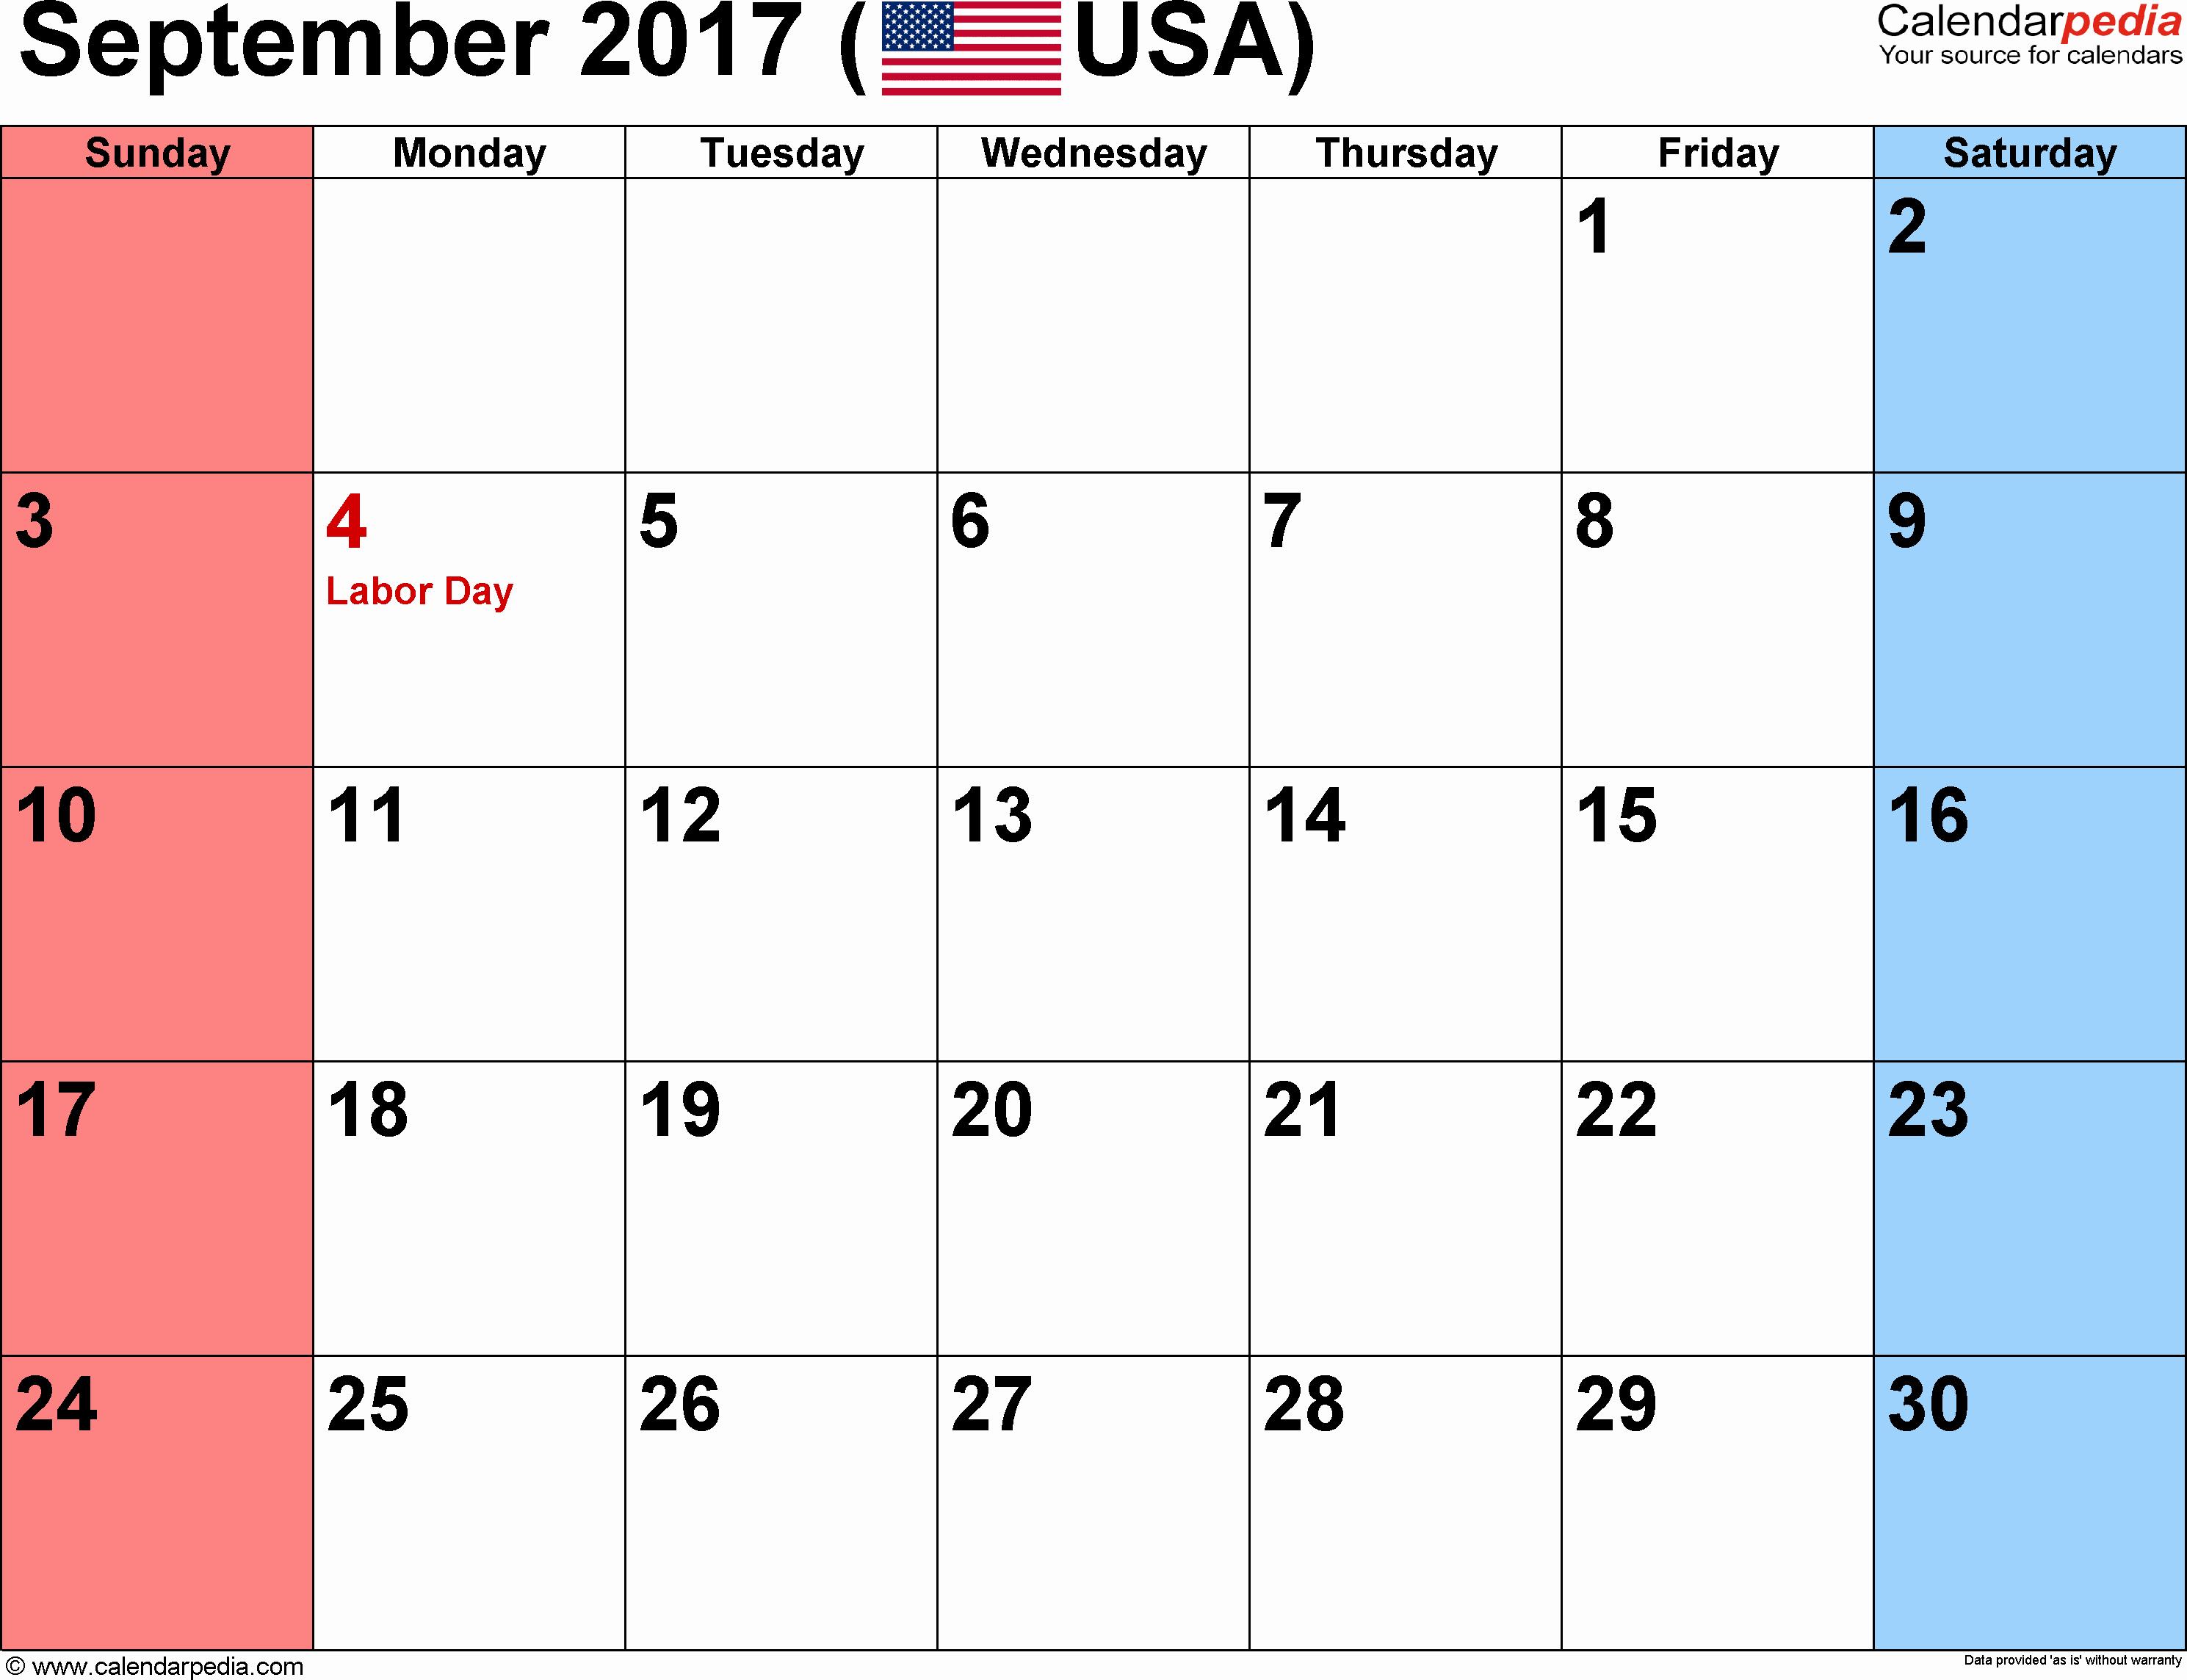 September 2017 Printable Calendar Word Best Of September 2017 Calendars for Word Excel & Pdf